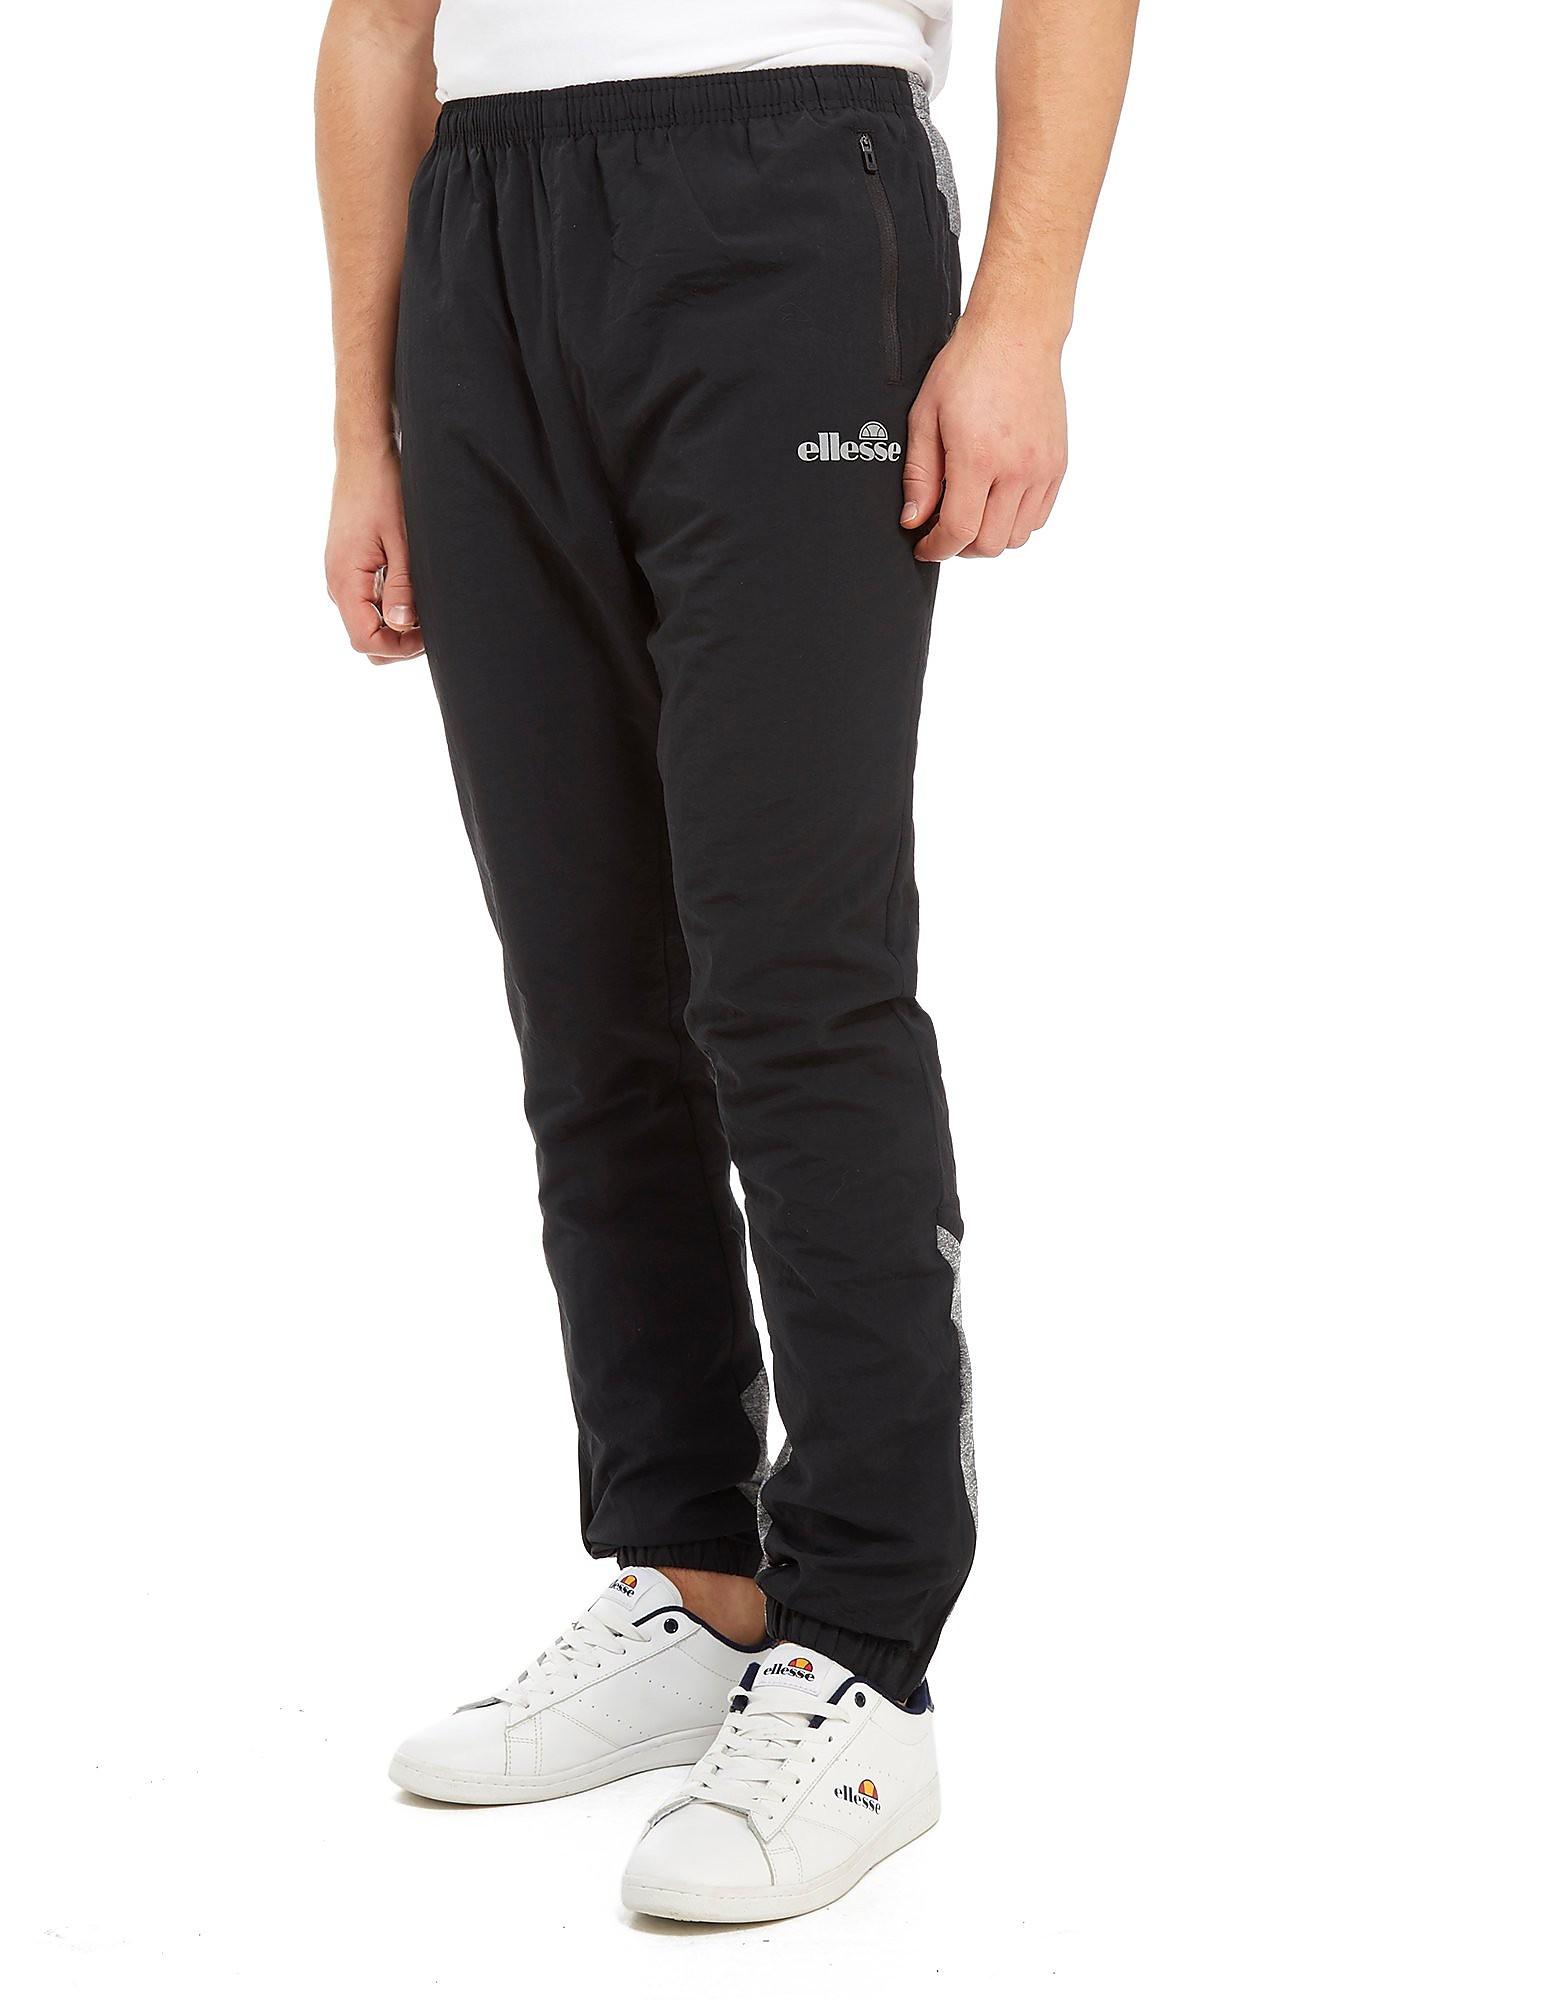 Ellesse Busi Woven Pants